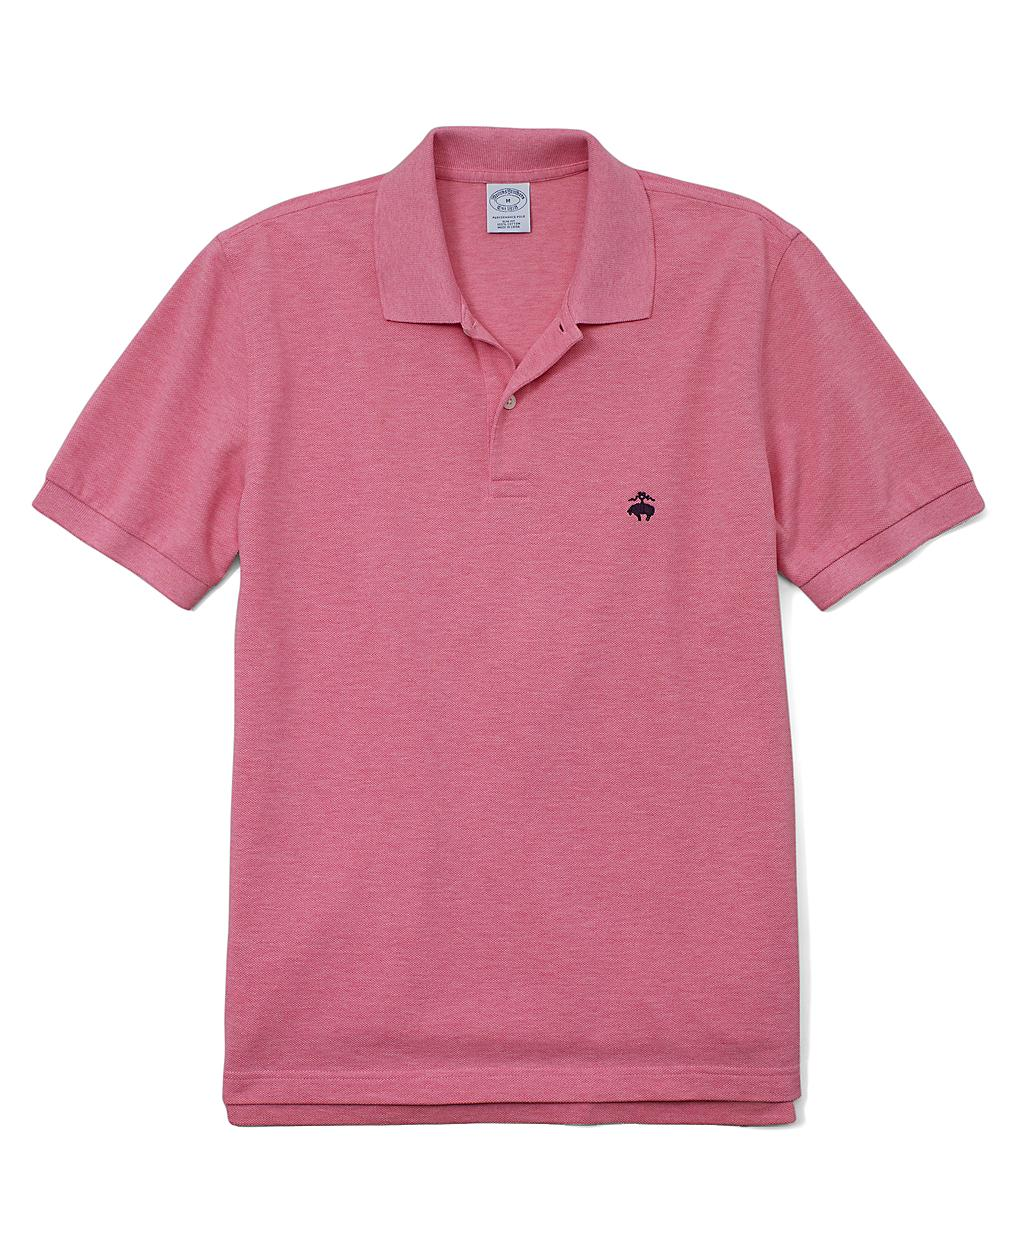 store or trend brooks brothers designer brooks brothers retailerBrooks Brothers Polo